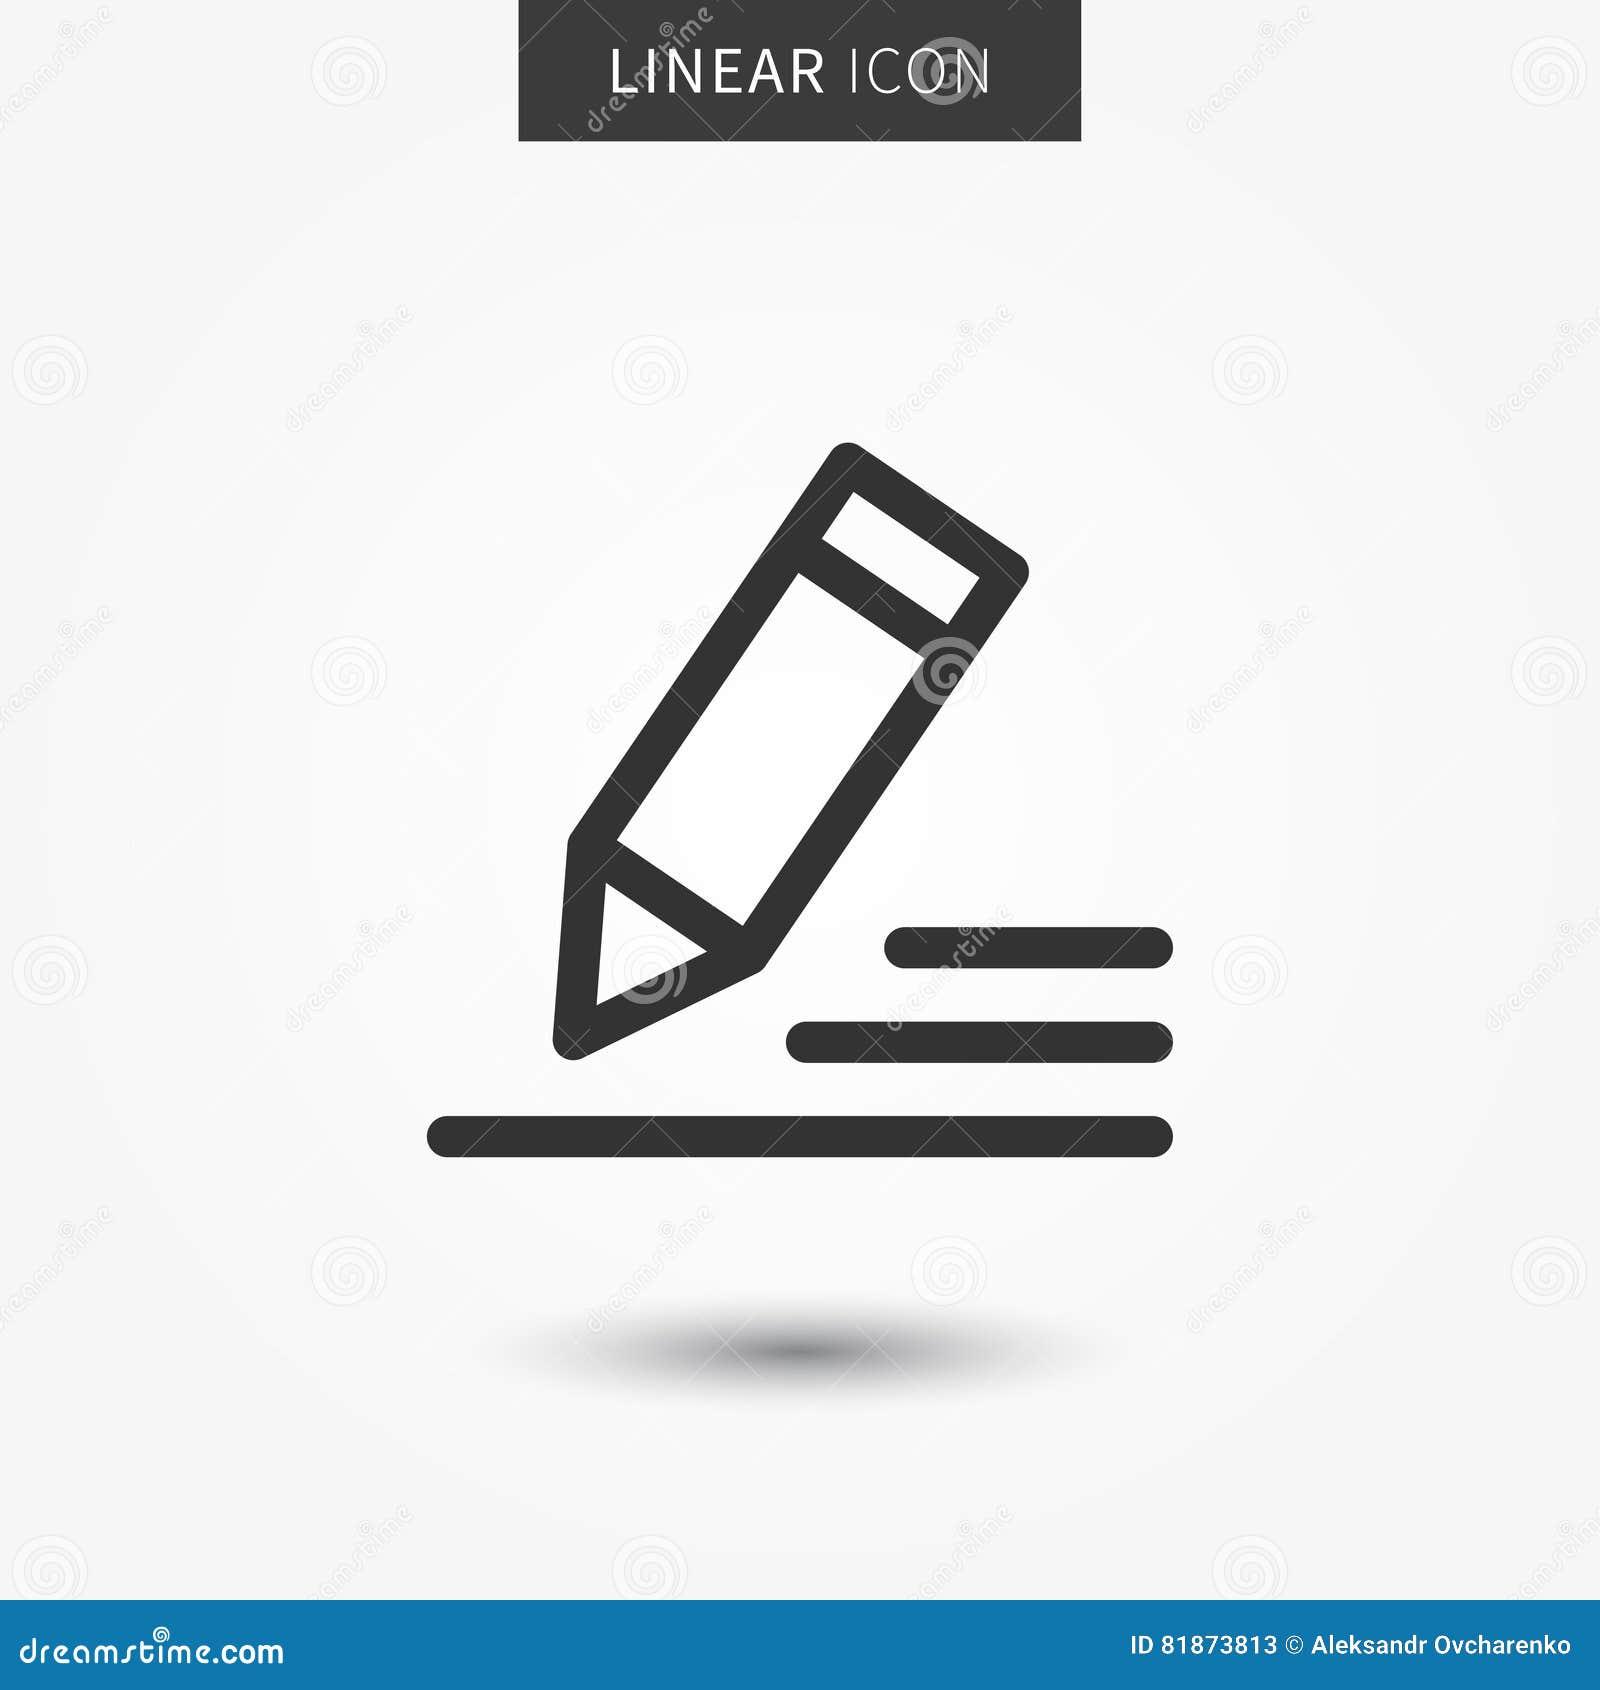 Pen icon vector illustration stock vector illustration of file pen icon vector illustration biocorpaavc Choice Image